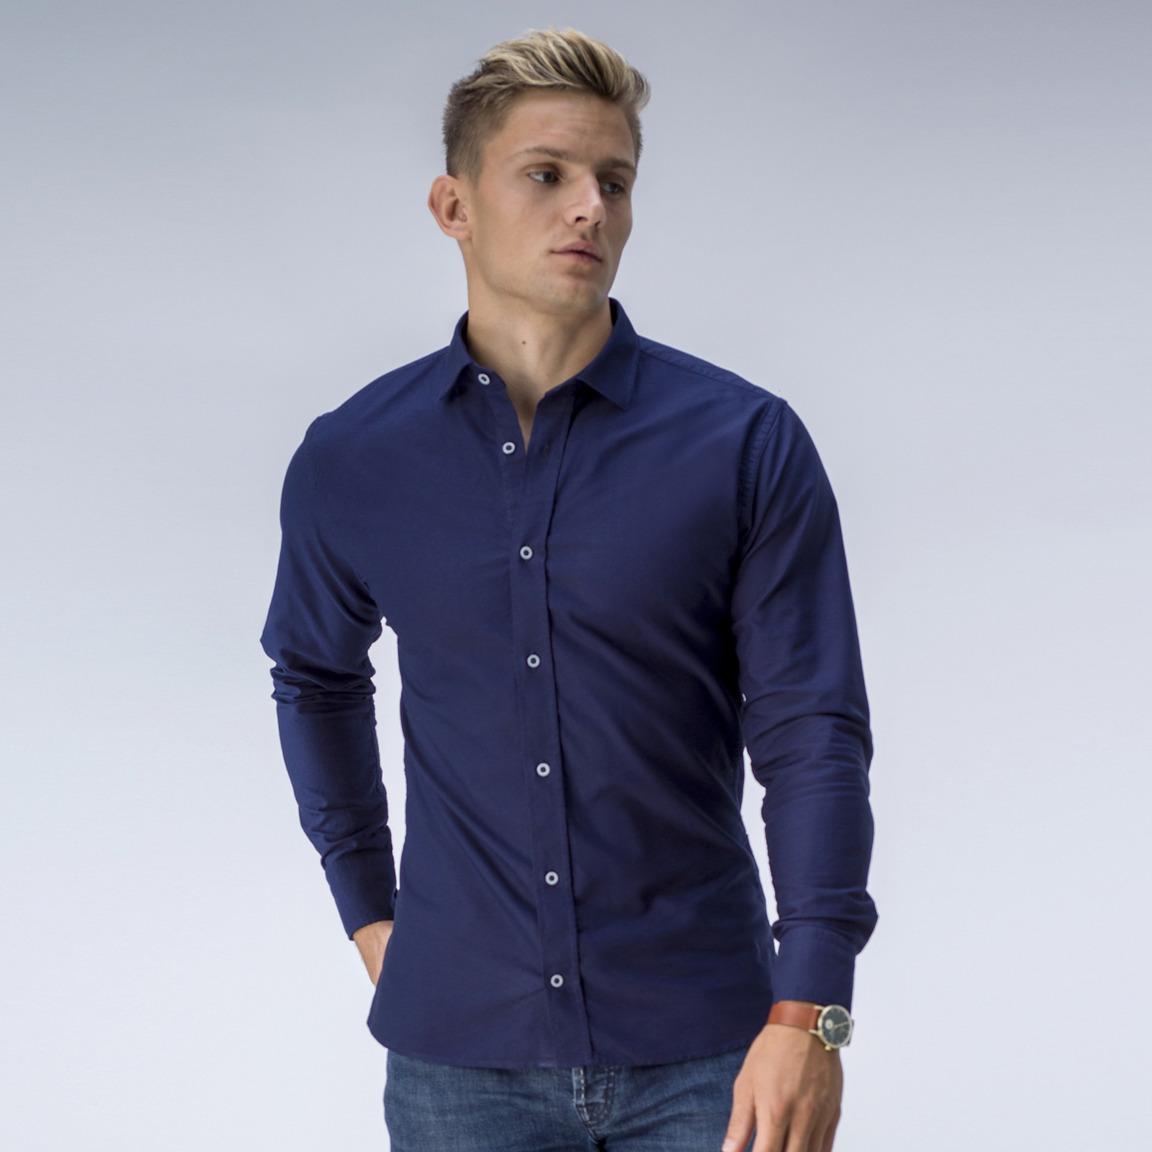 Navy oxford dress shirt<br>